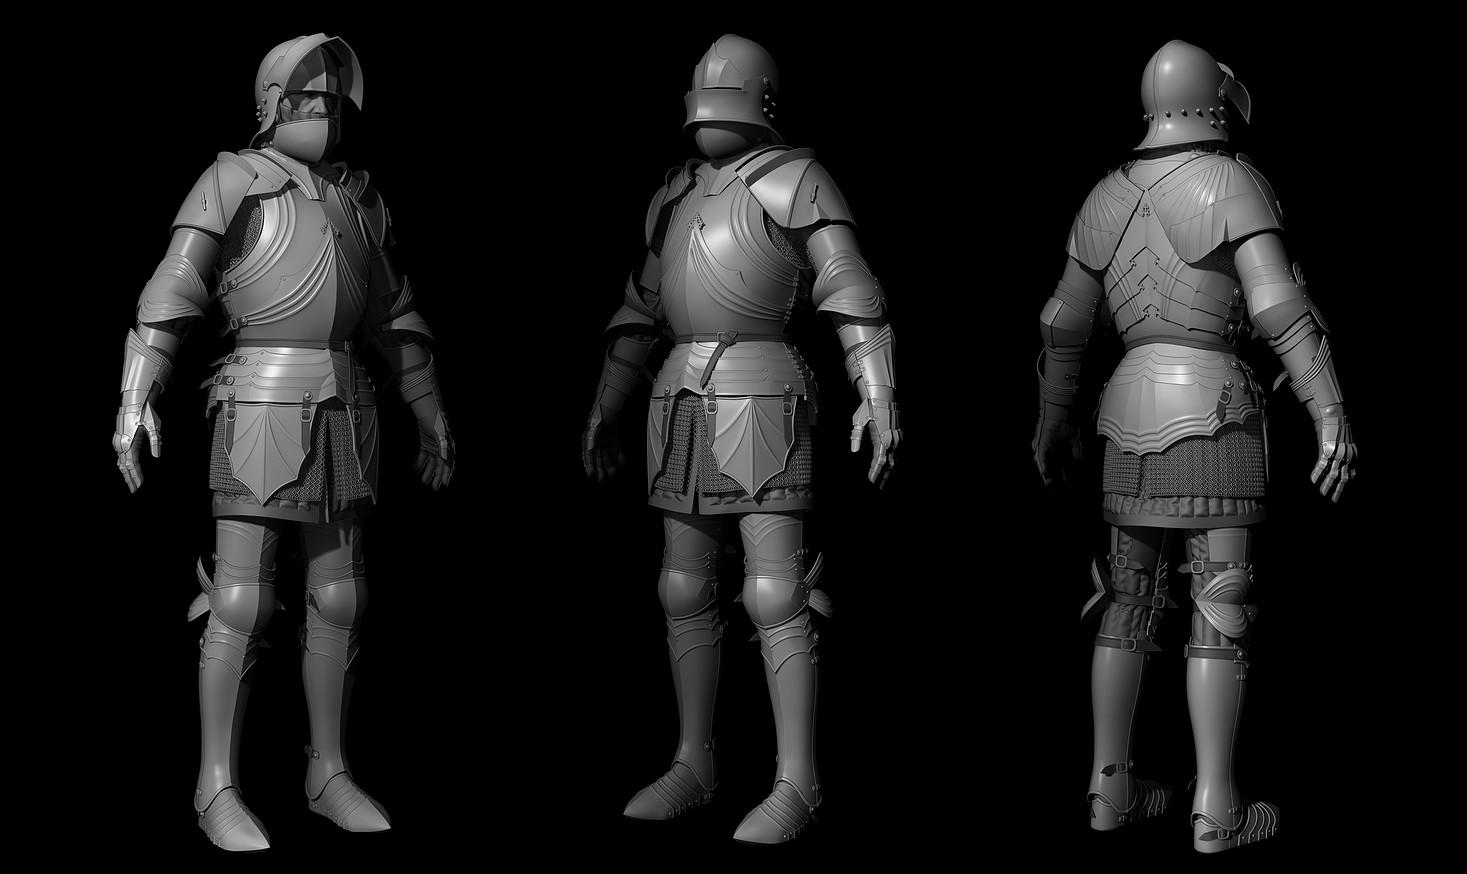 ArtStation - Gothic Armour - CryEngine project, Kamil Bigos